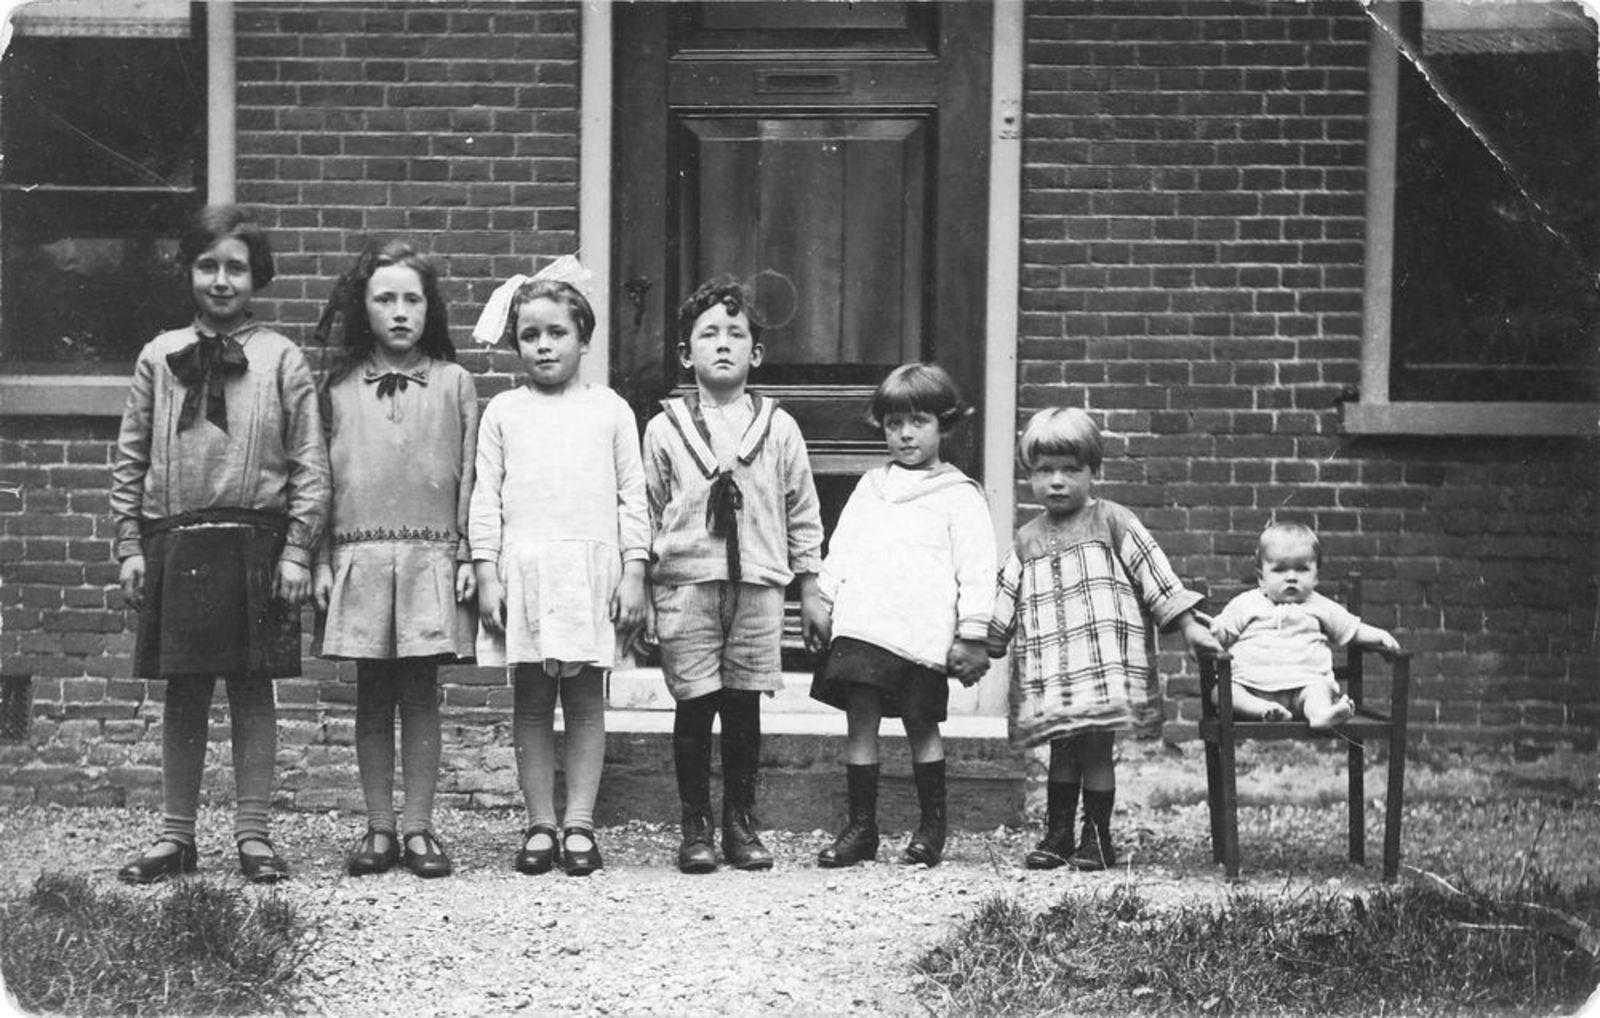 Calvelage Bernard 1885 1930± Kinderen